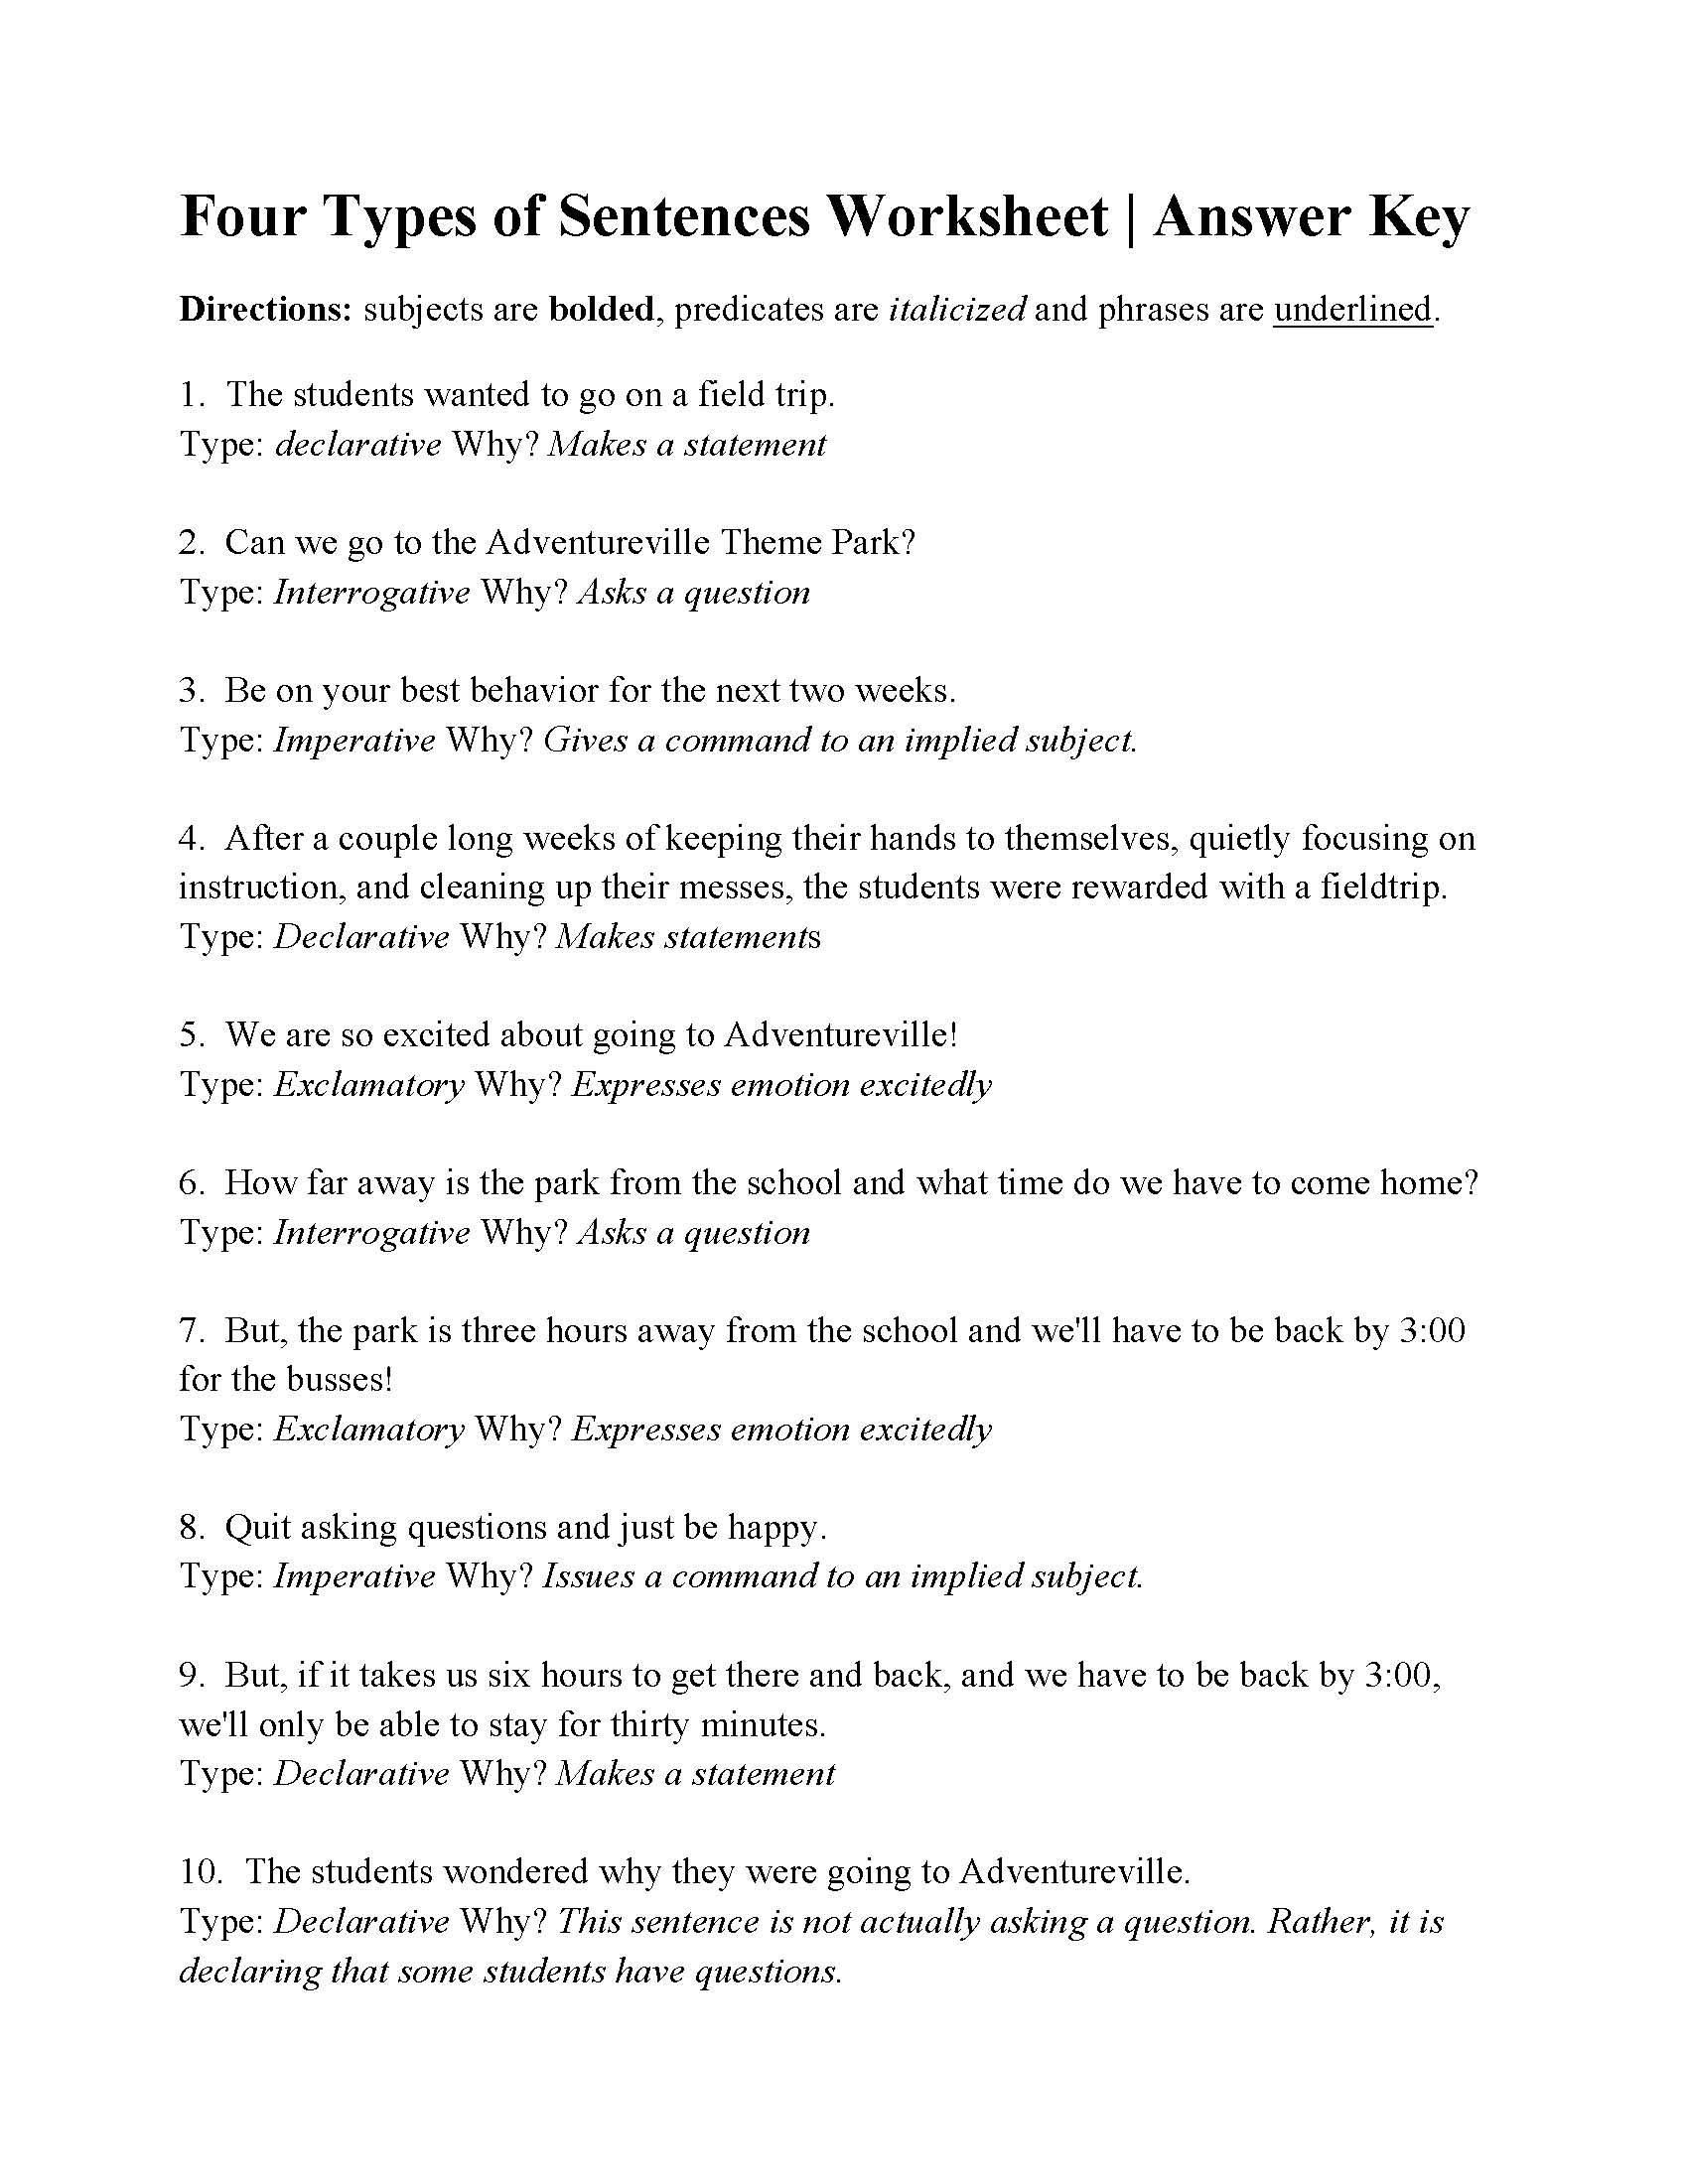 Four Types of Sentences Worksheet